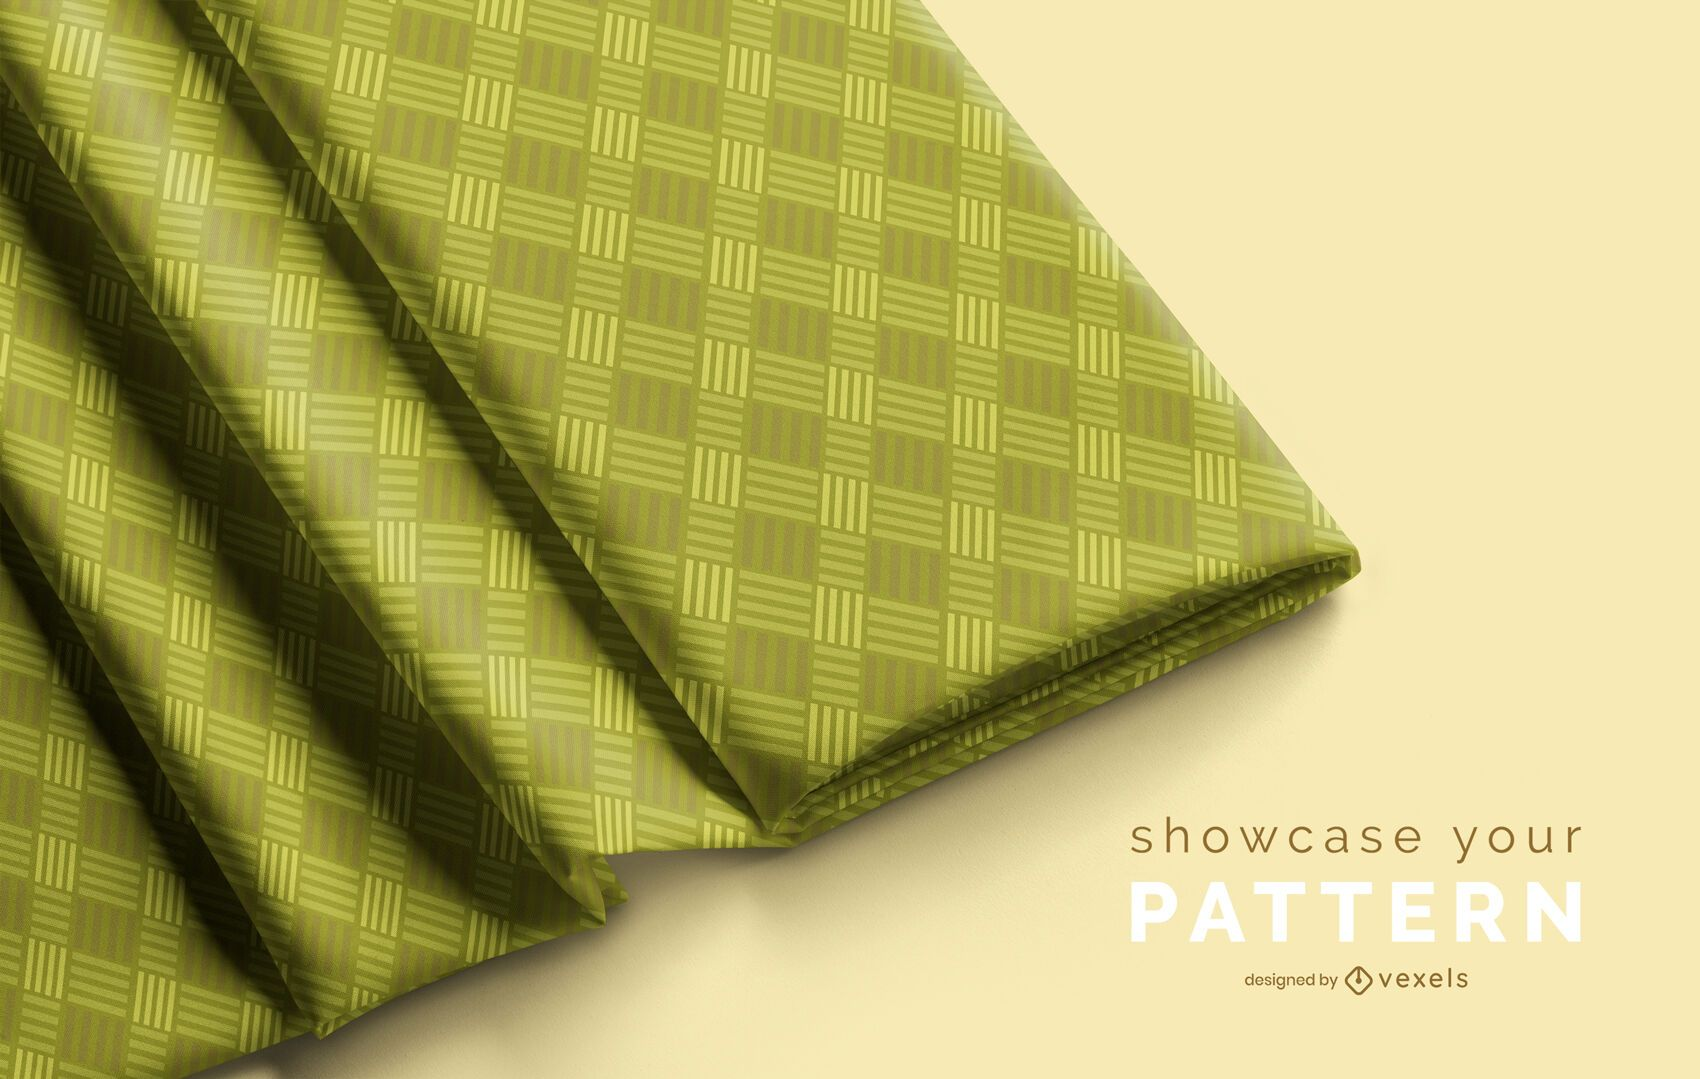 Folded fabric mockup design